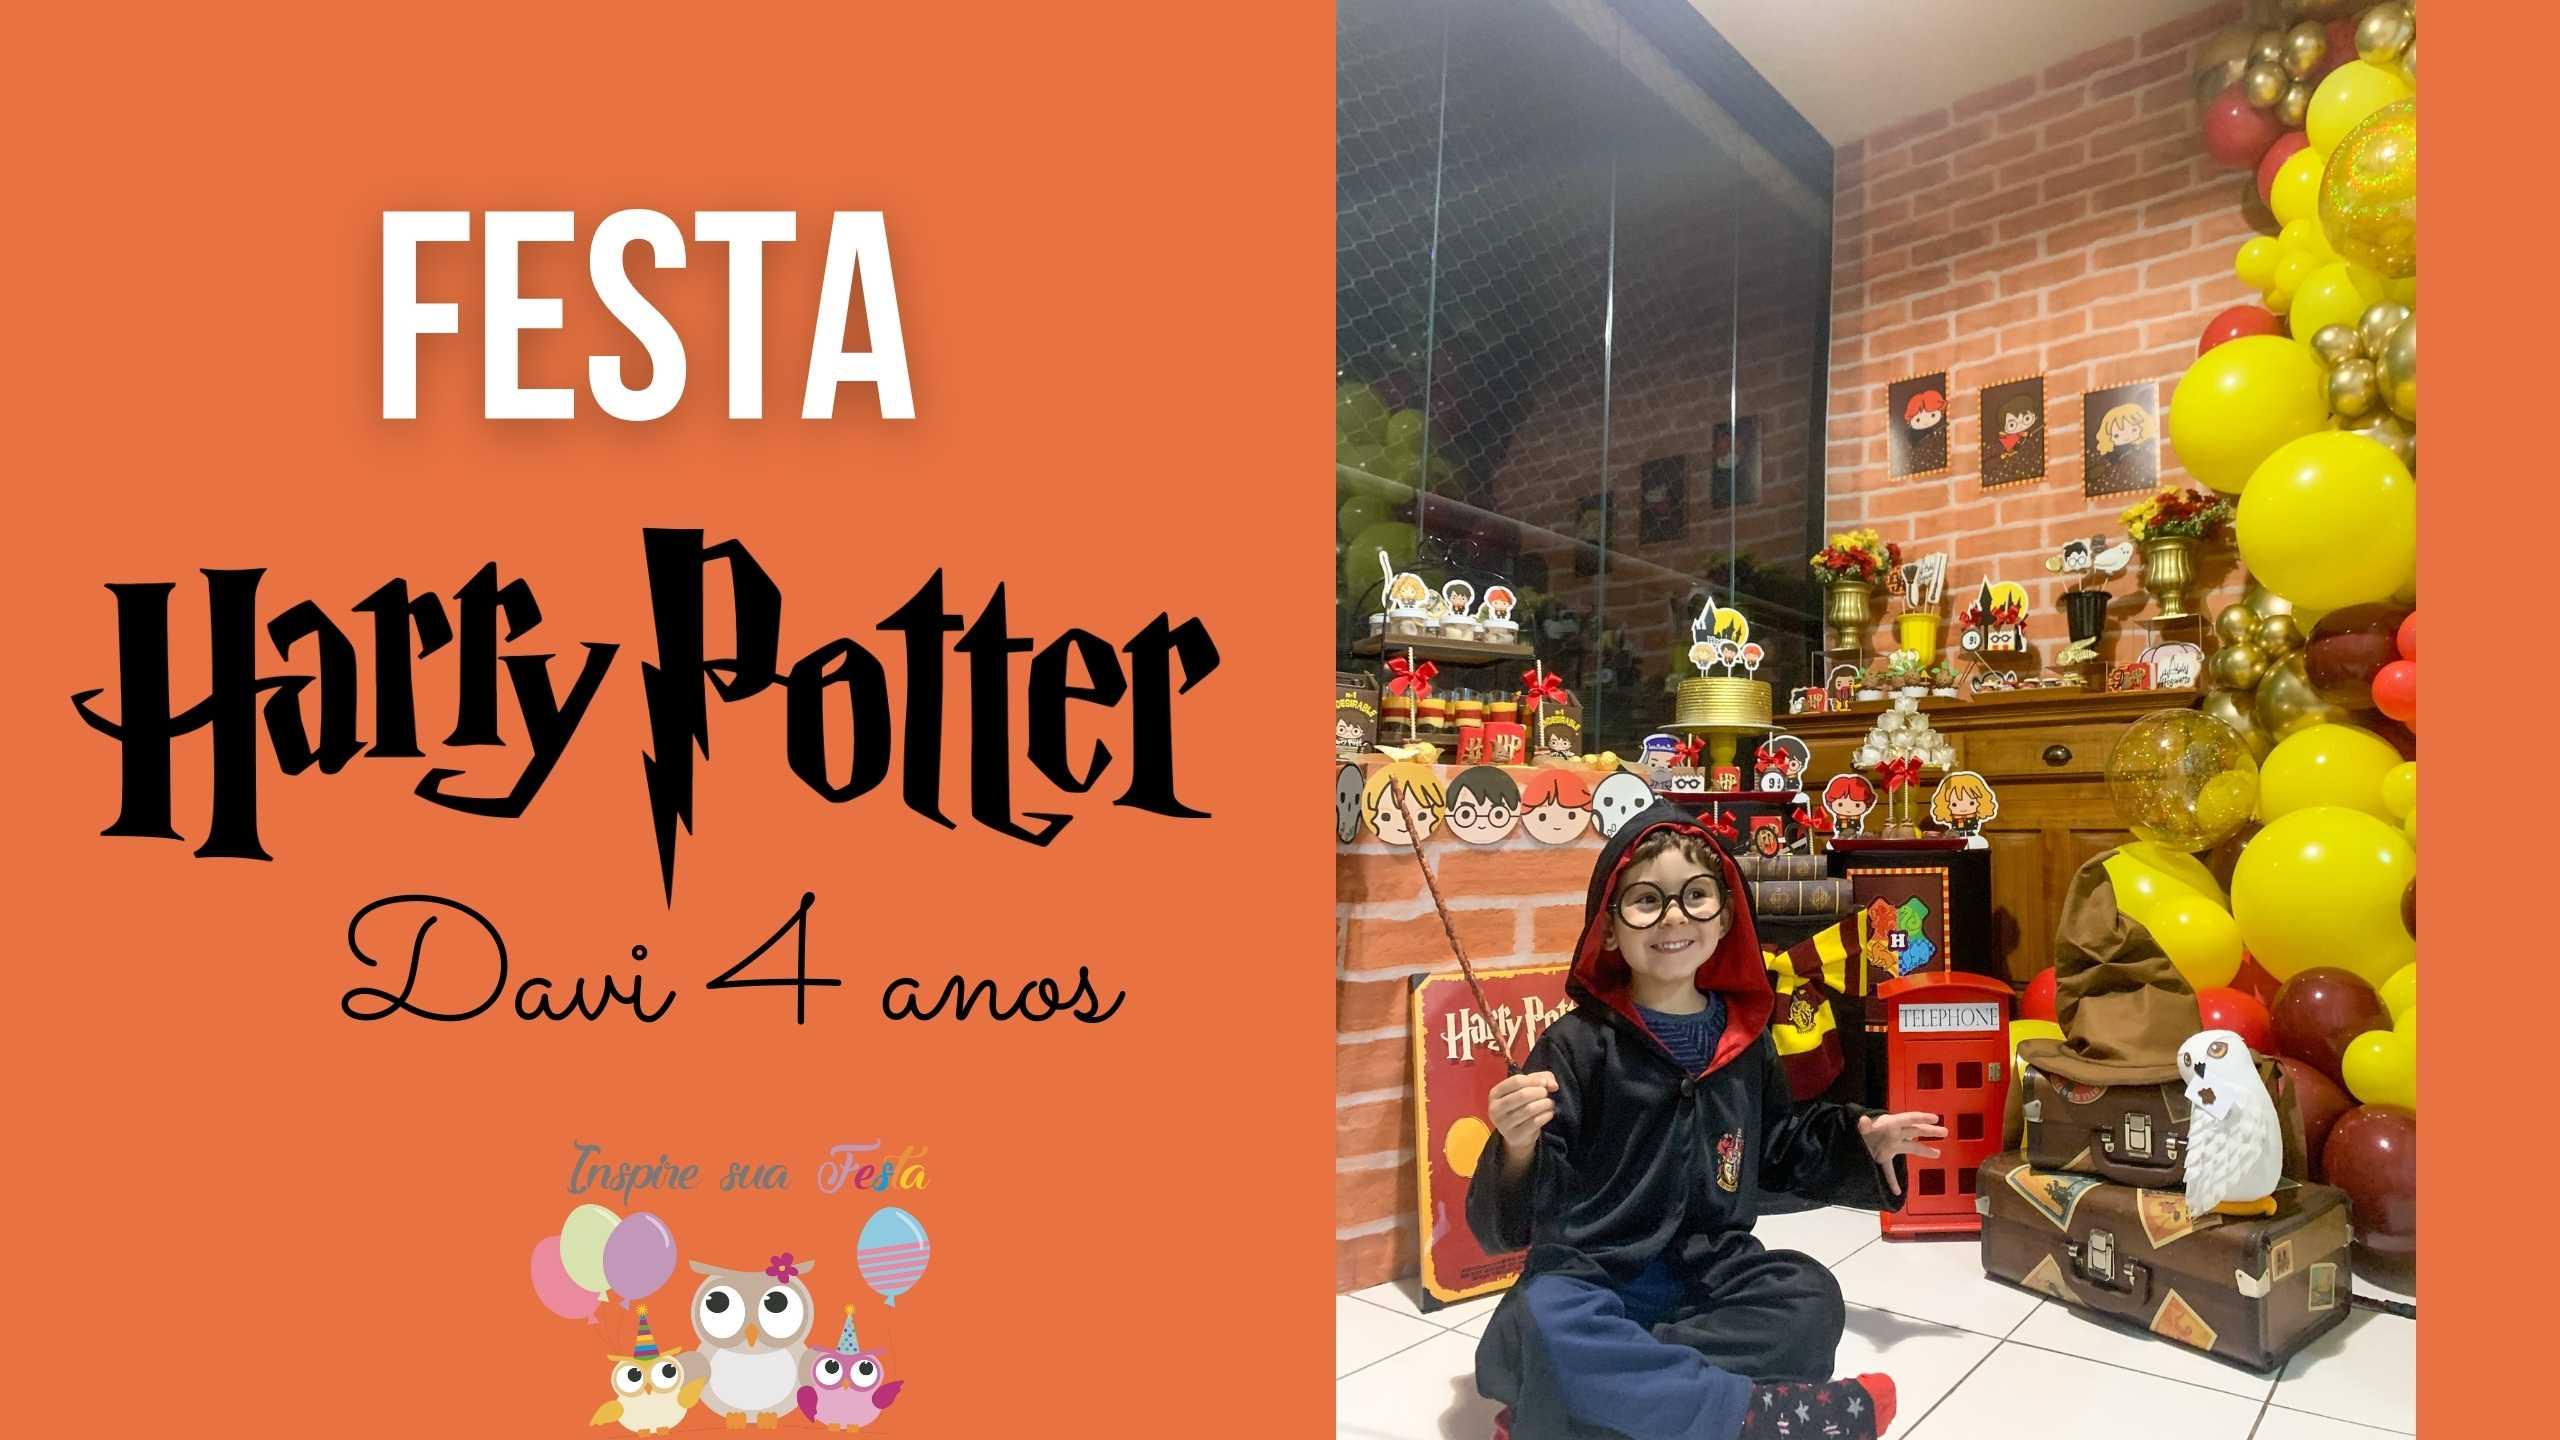 Festa Harry Potter Cute – Davi 4 anos